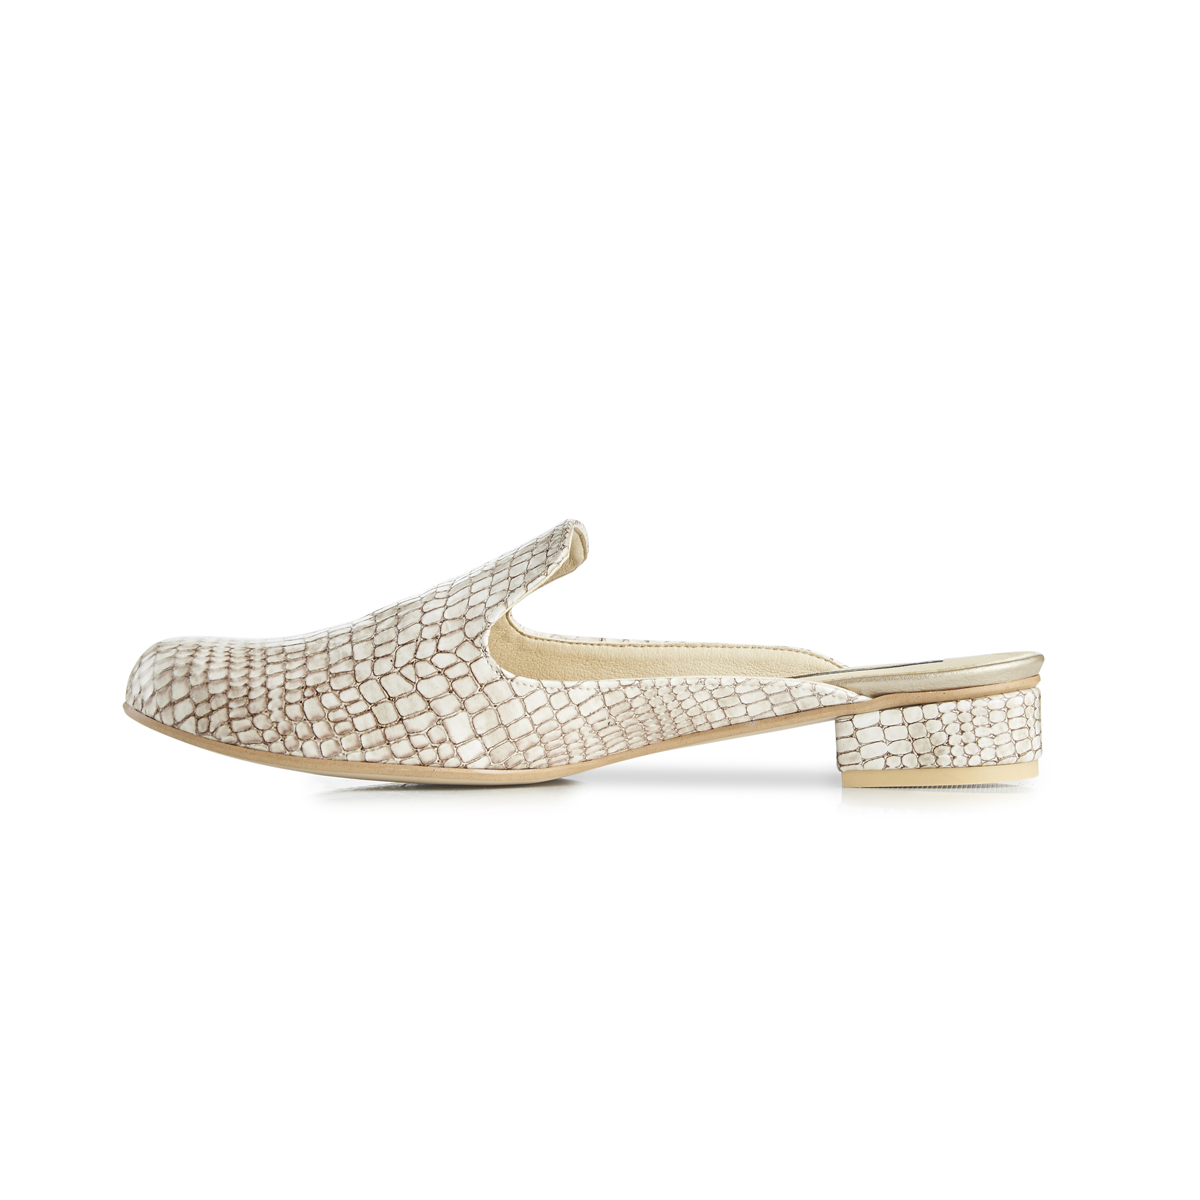 Charlie croc leather flat slip-on mules - beige